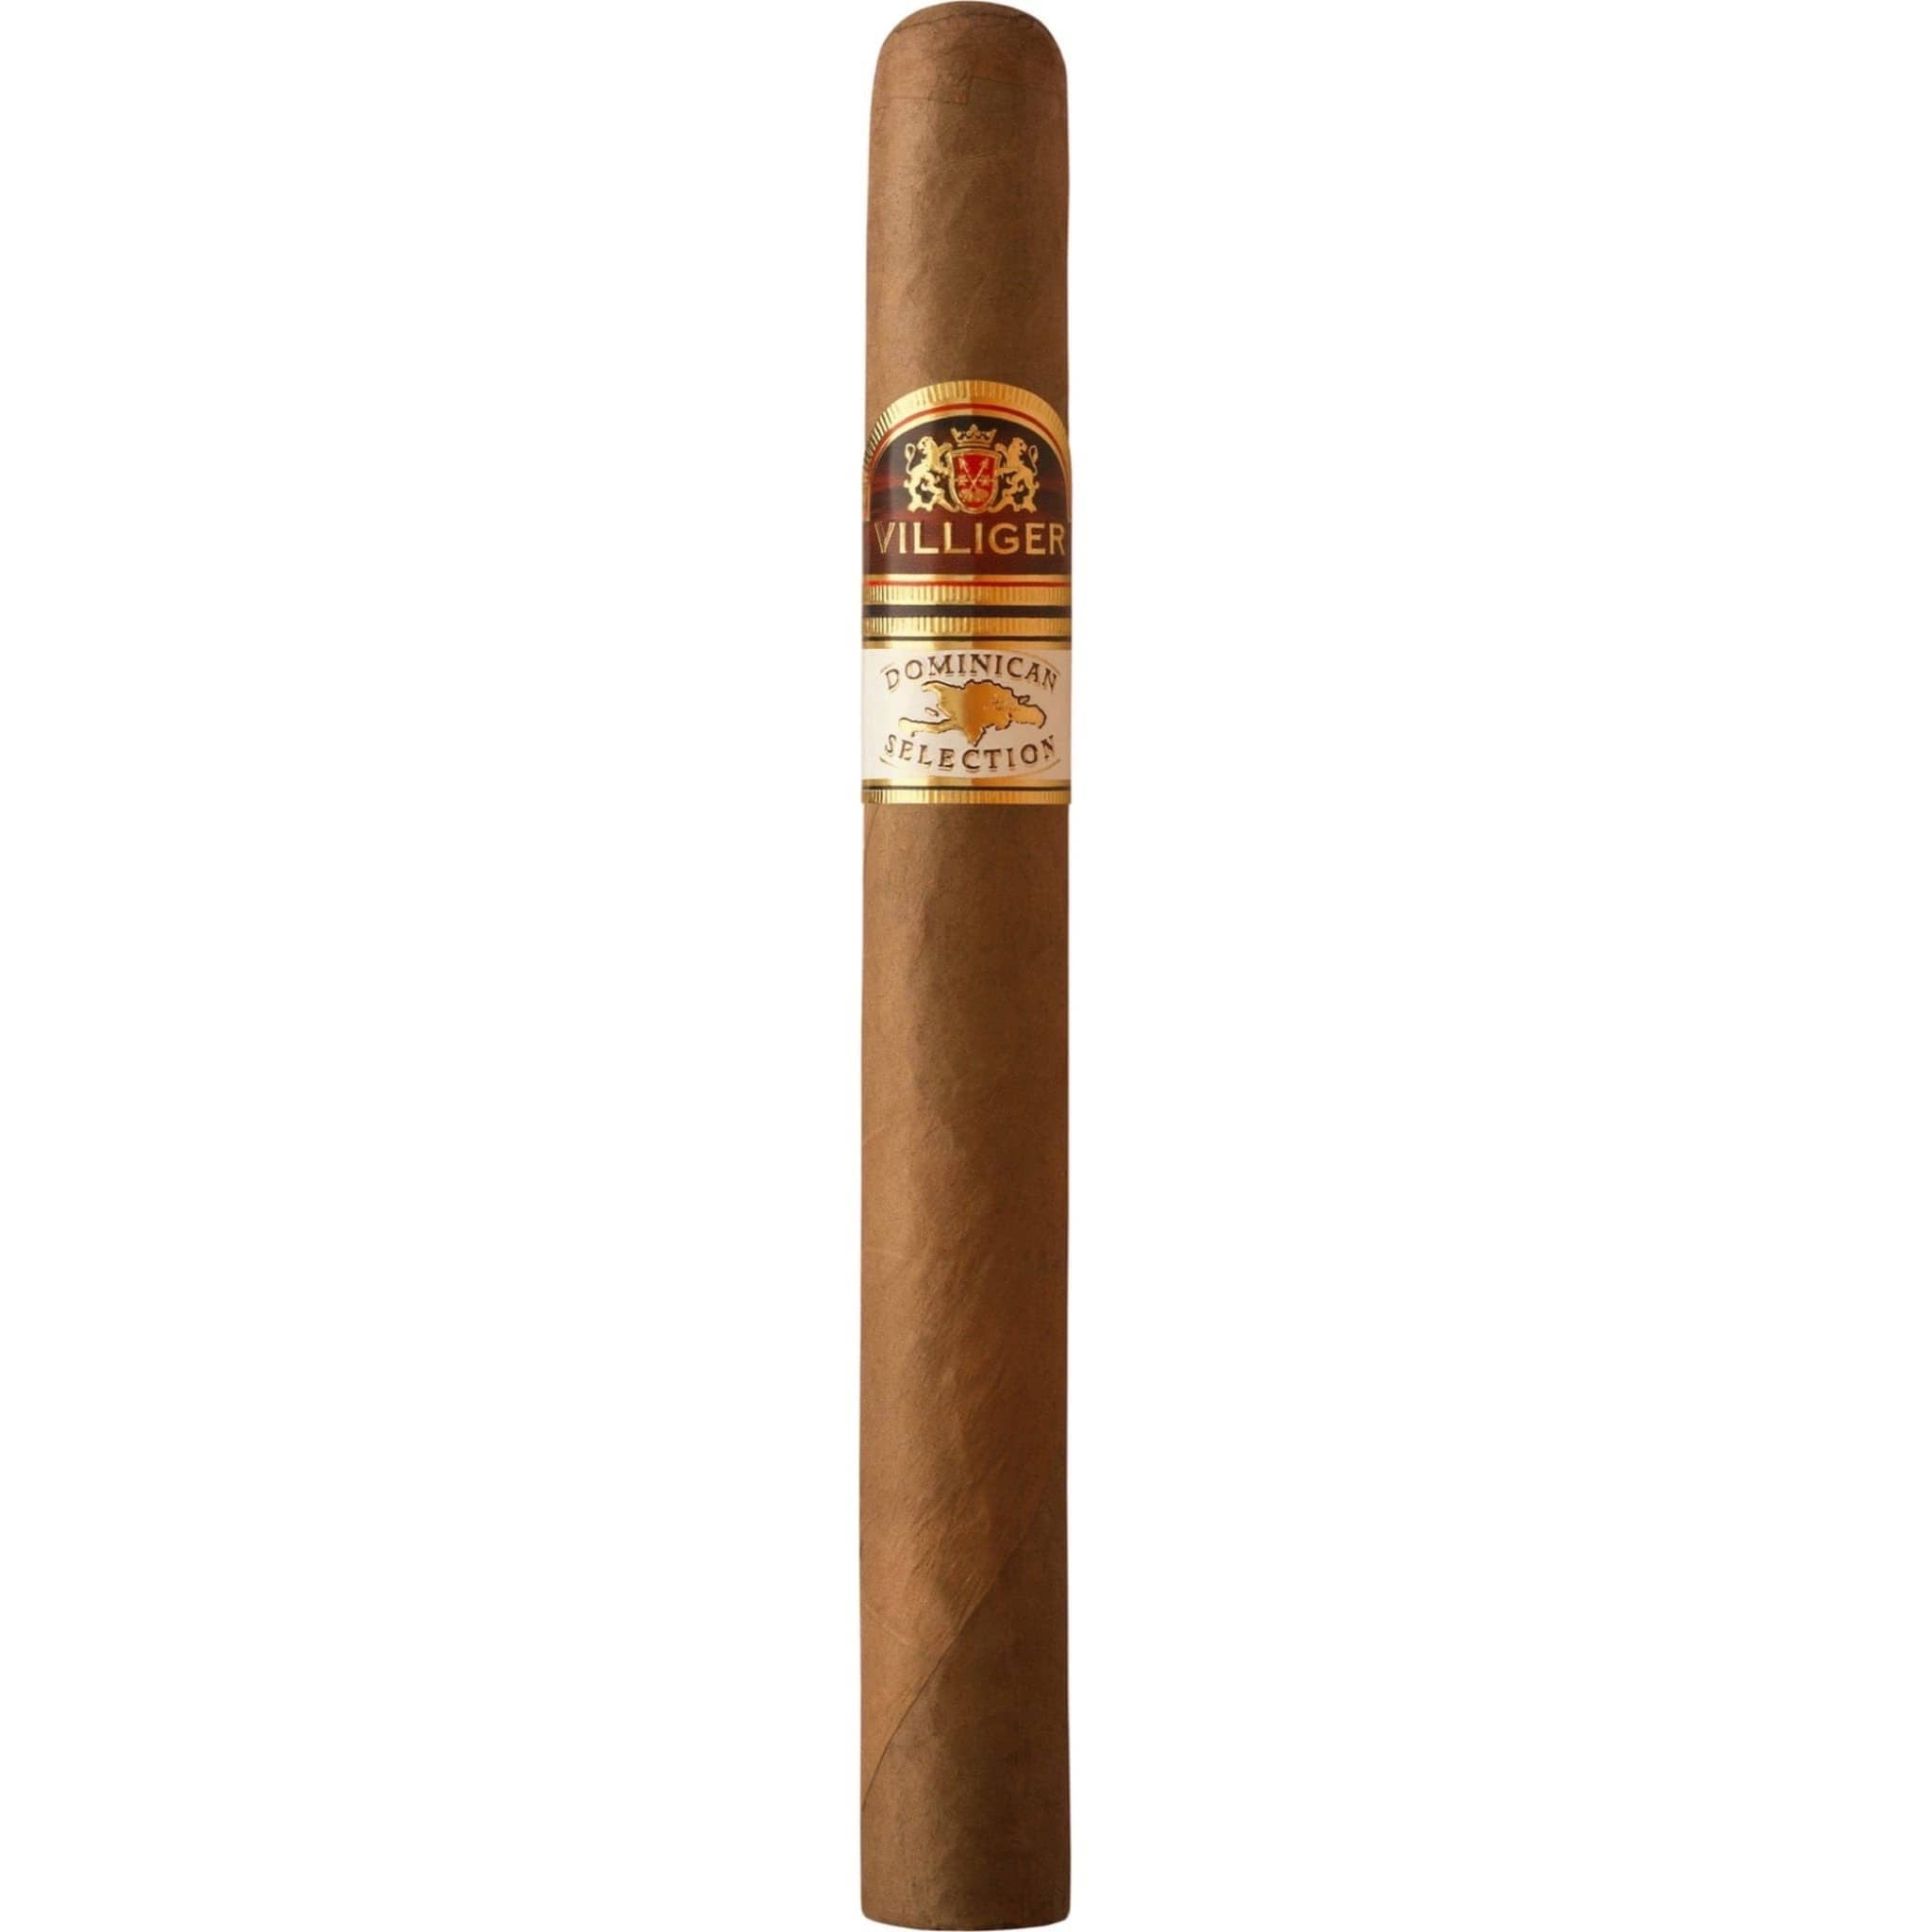 Villiger Dominican Selection Churchill